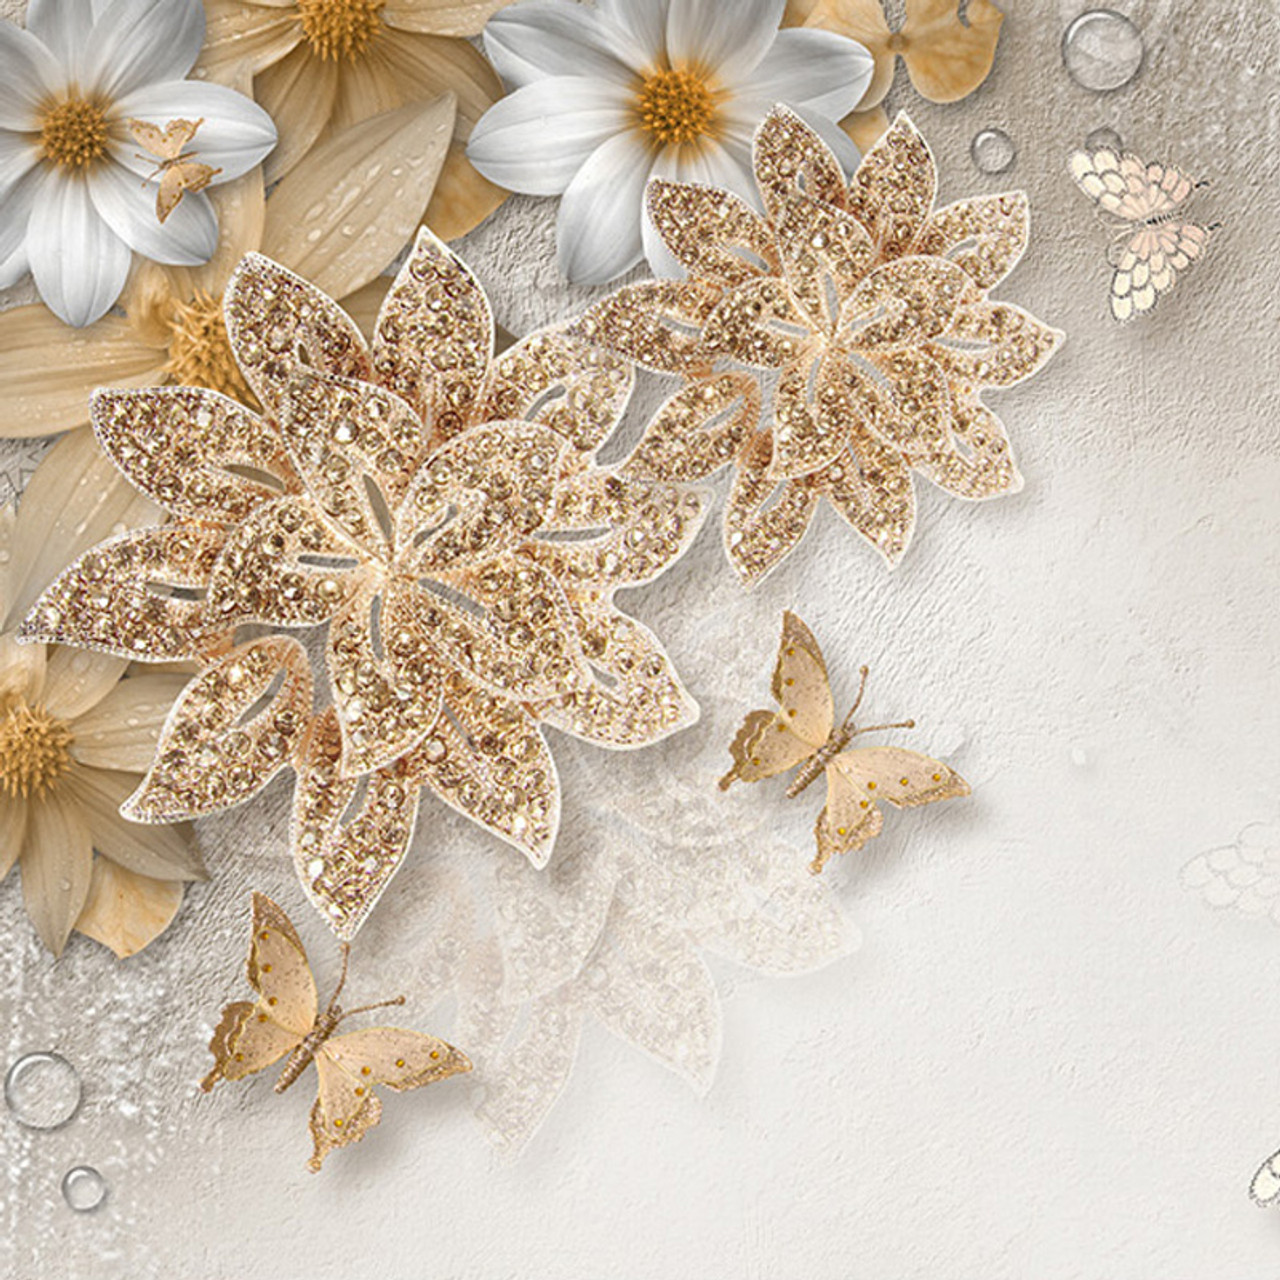 Custom Mural Wallpaper For Bedroom Walls 3D Luxury Gold